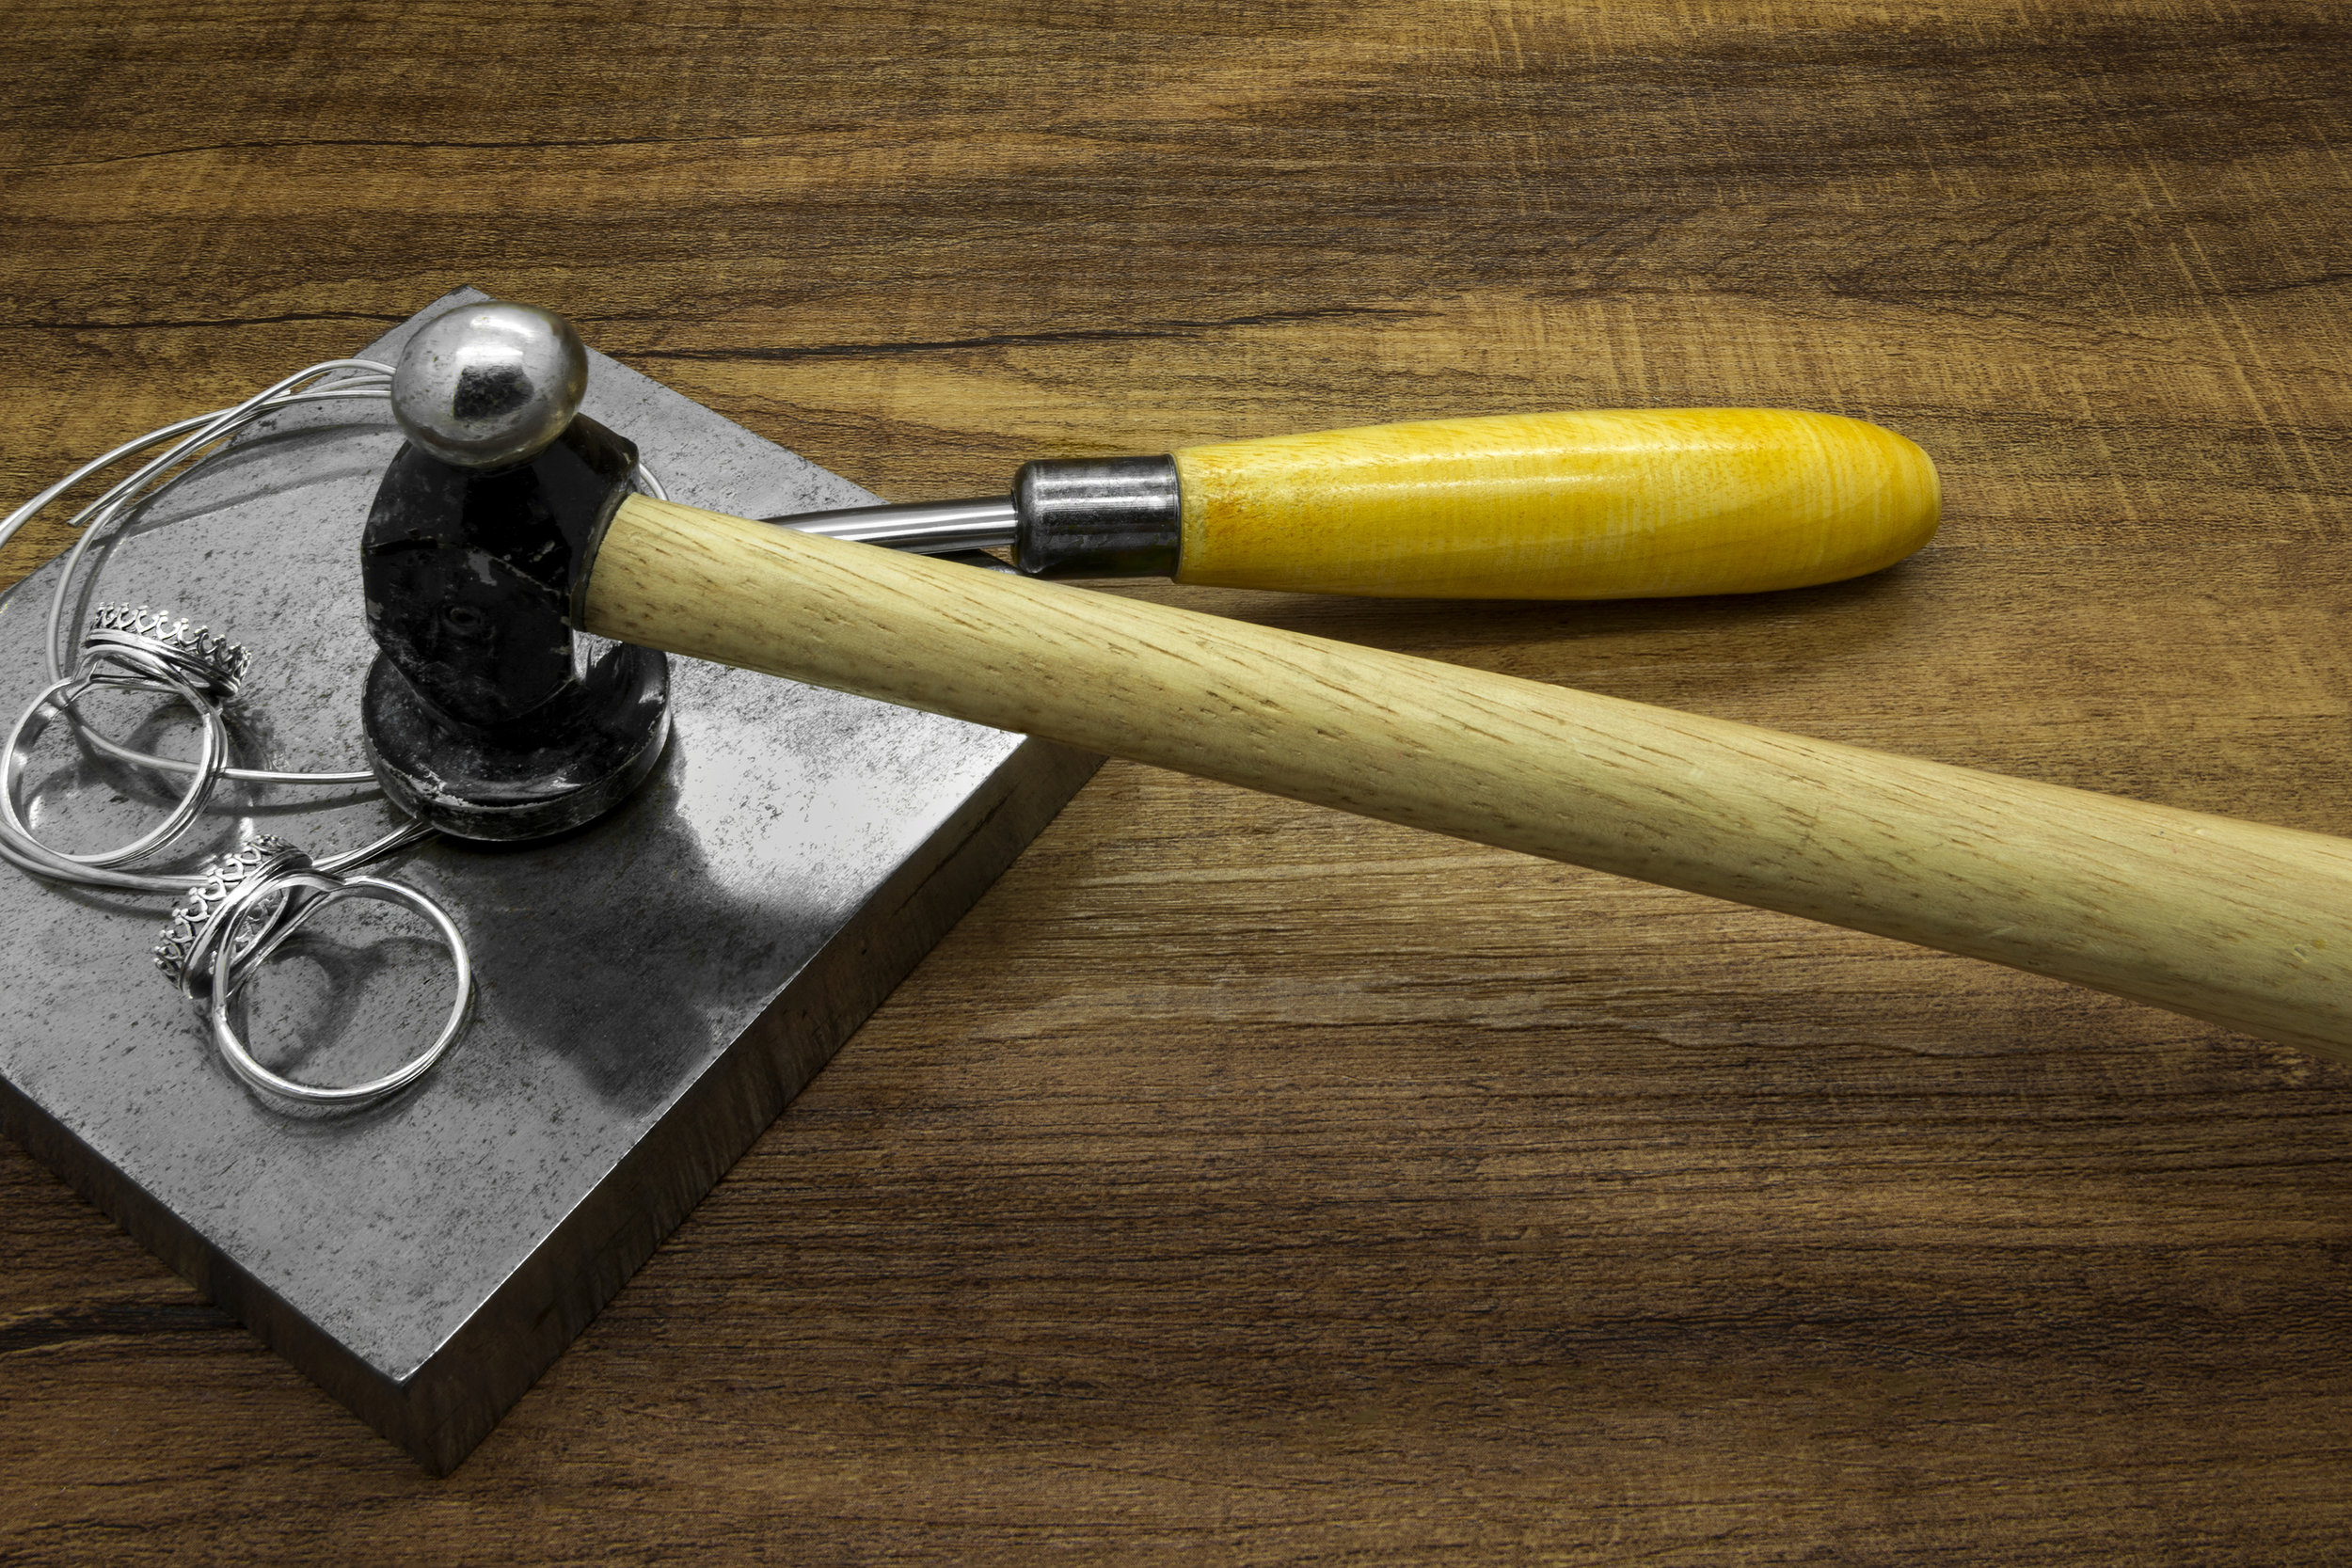 jewelry repair shop tools vancouver wa